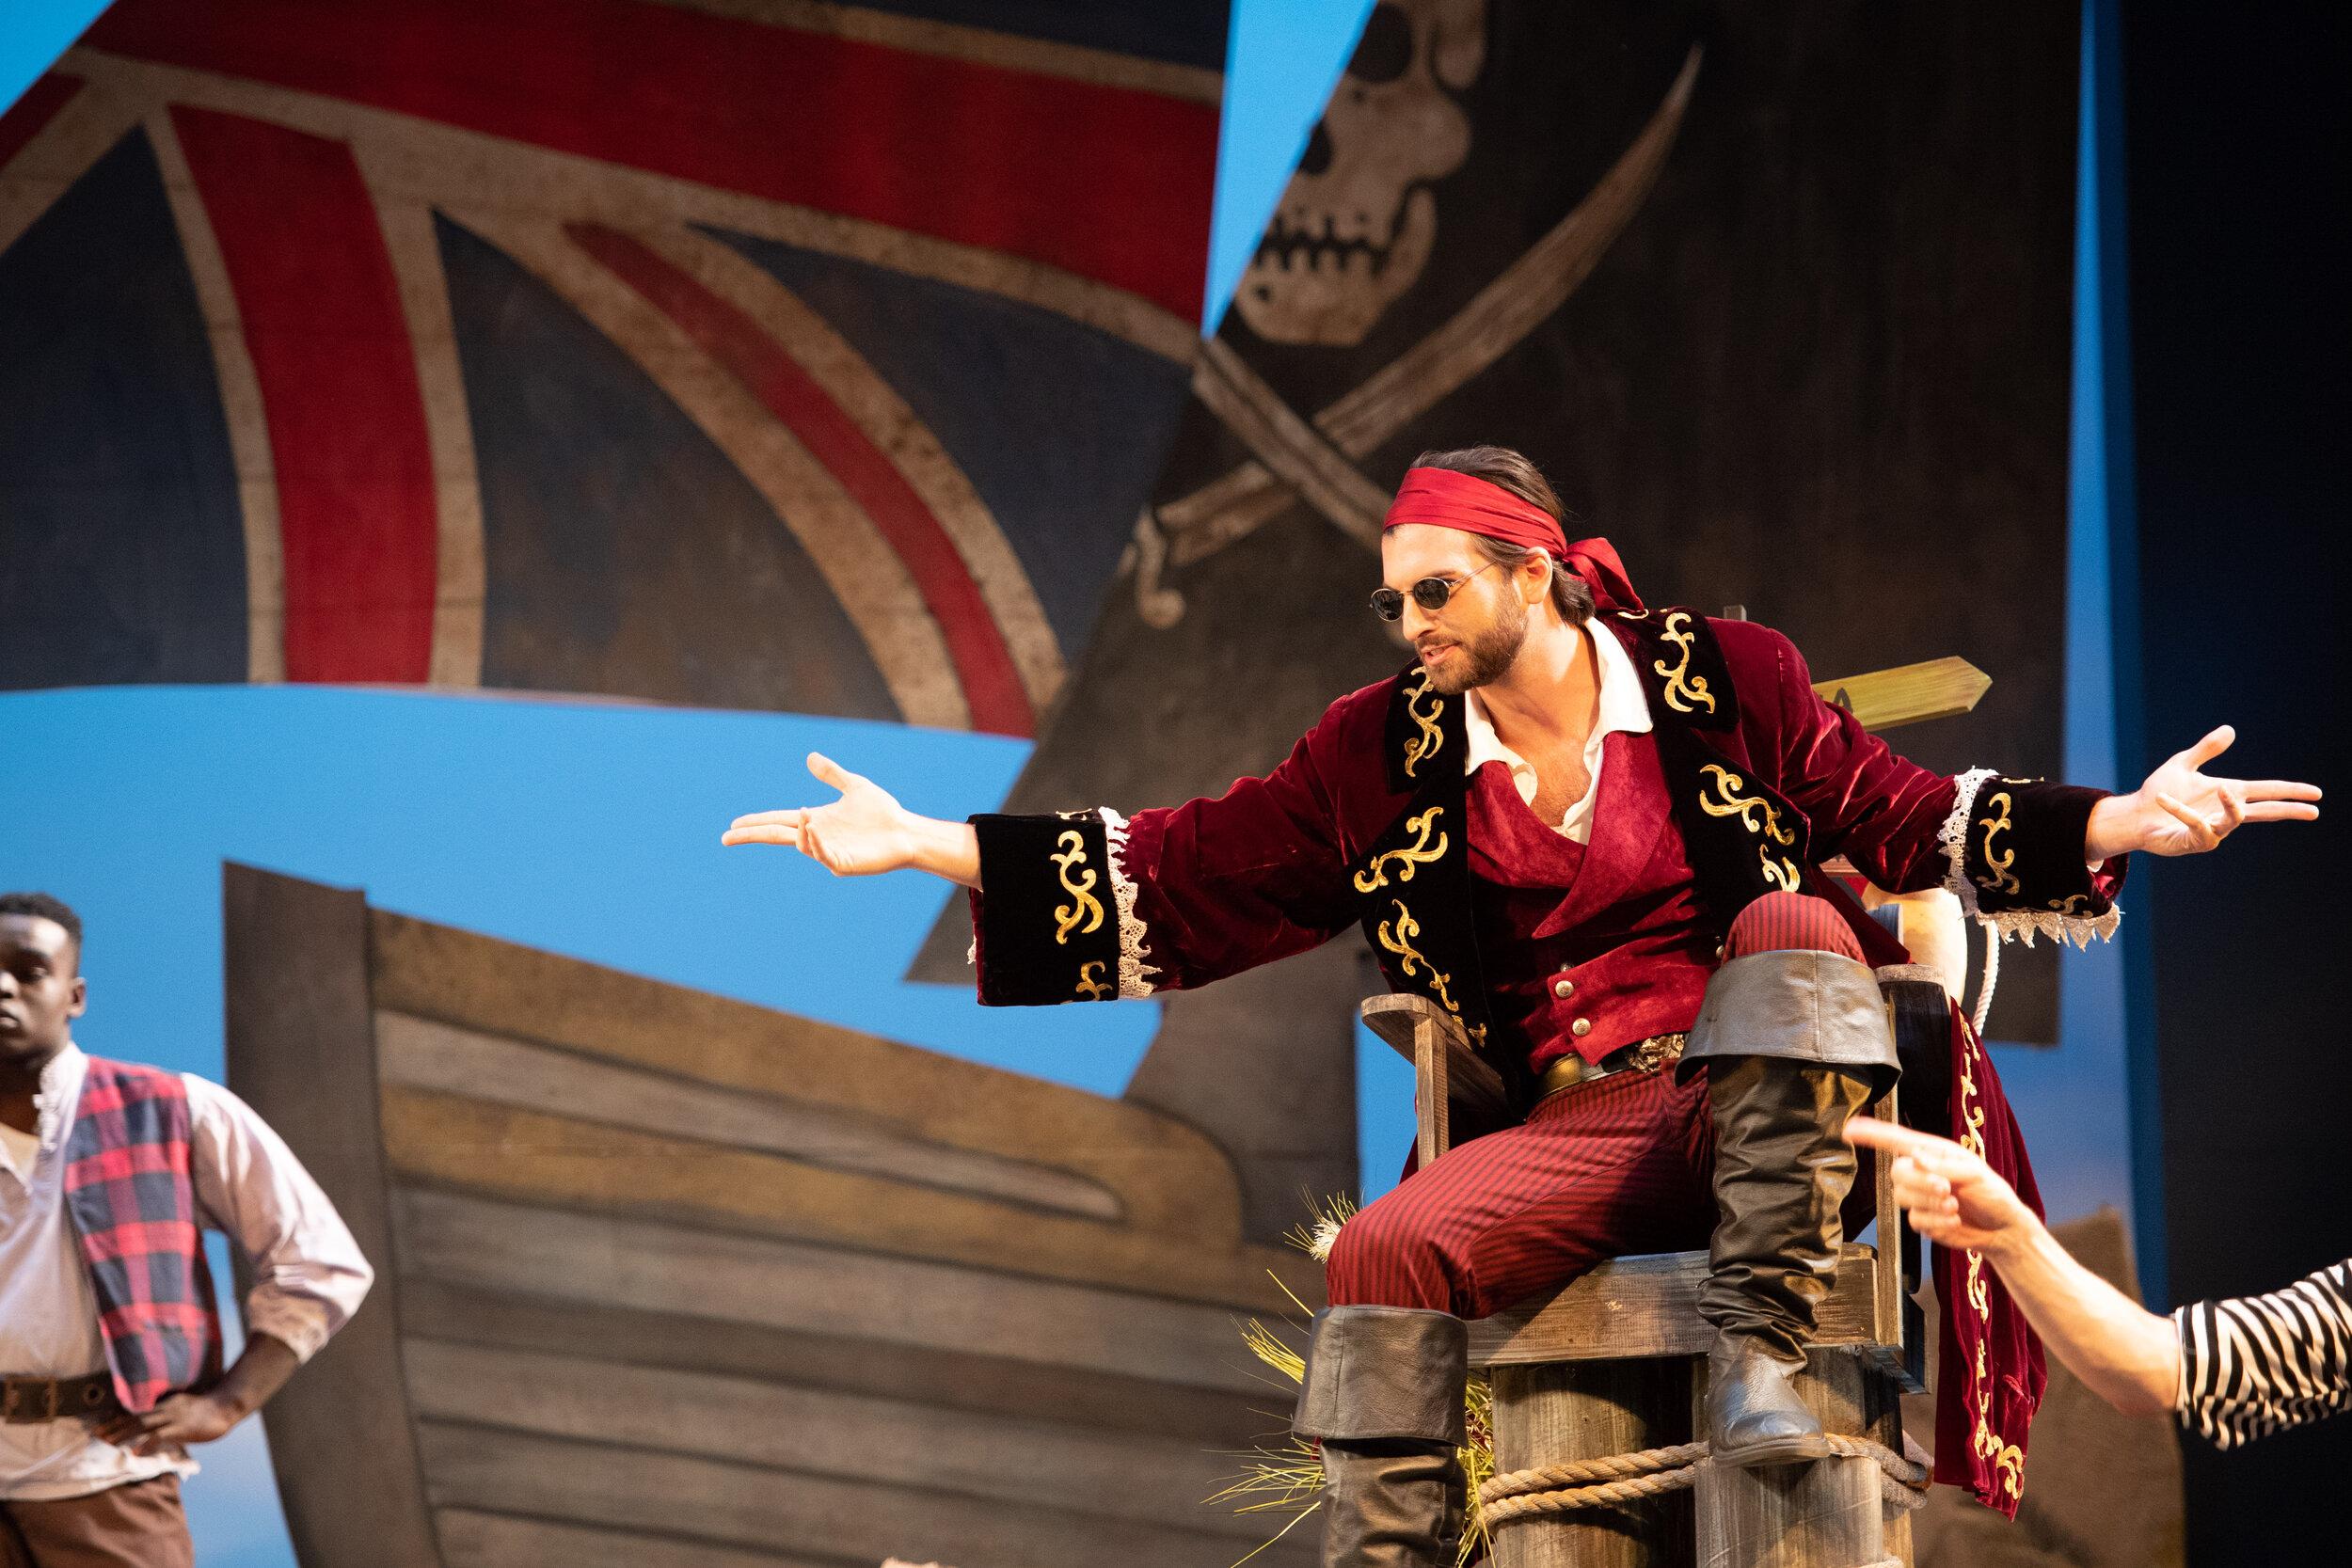 The Pirate King (photo by Matt Dilyard)